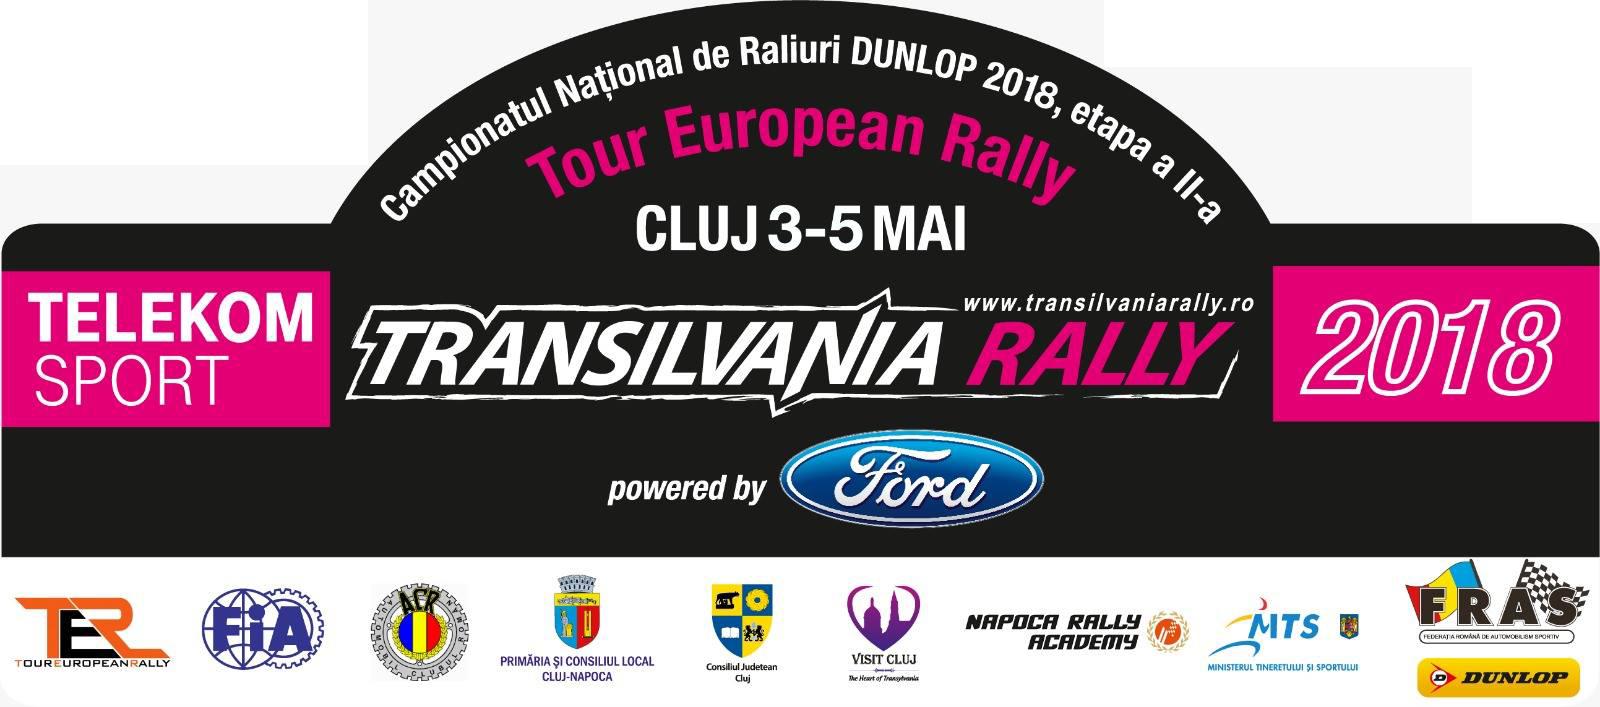 Transilvania Rally 2018 – Documente oficiale